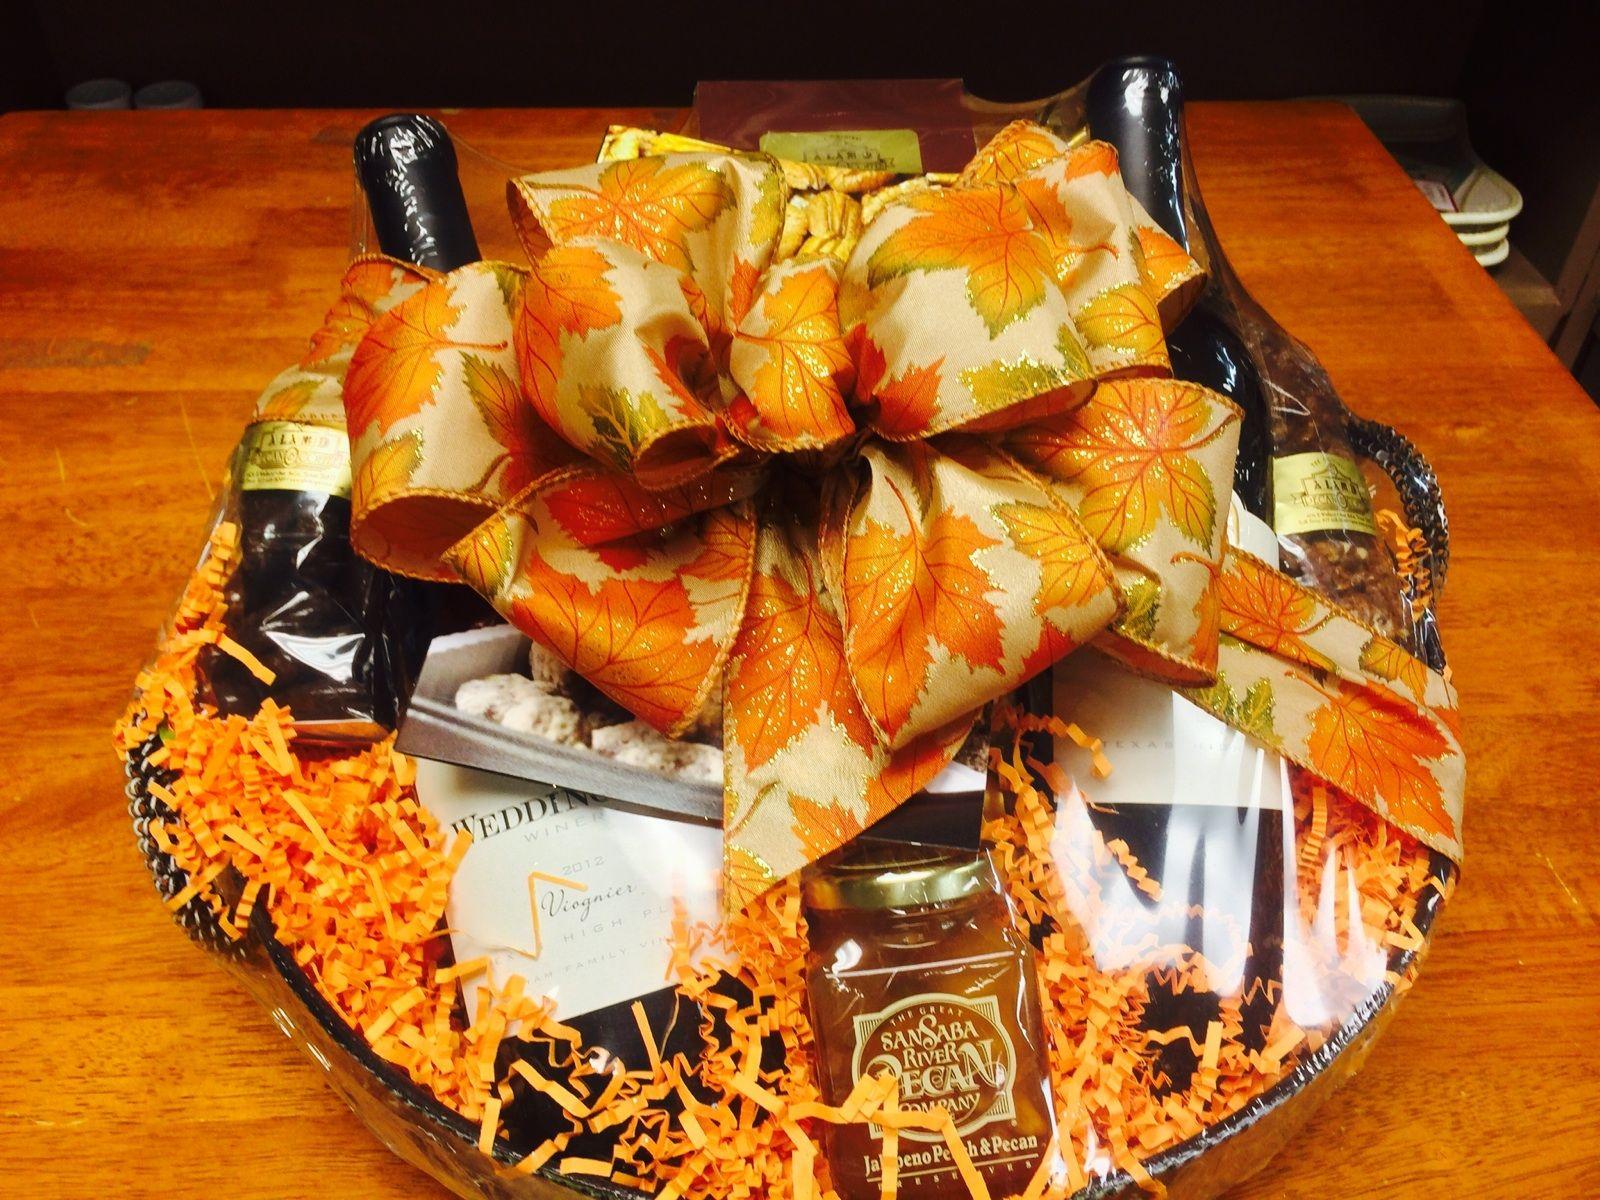 Alamo pecan wine baskets featuring wedding oak wines and